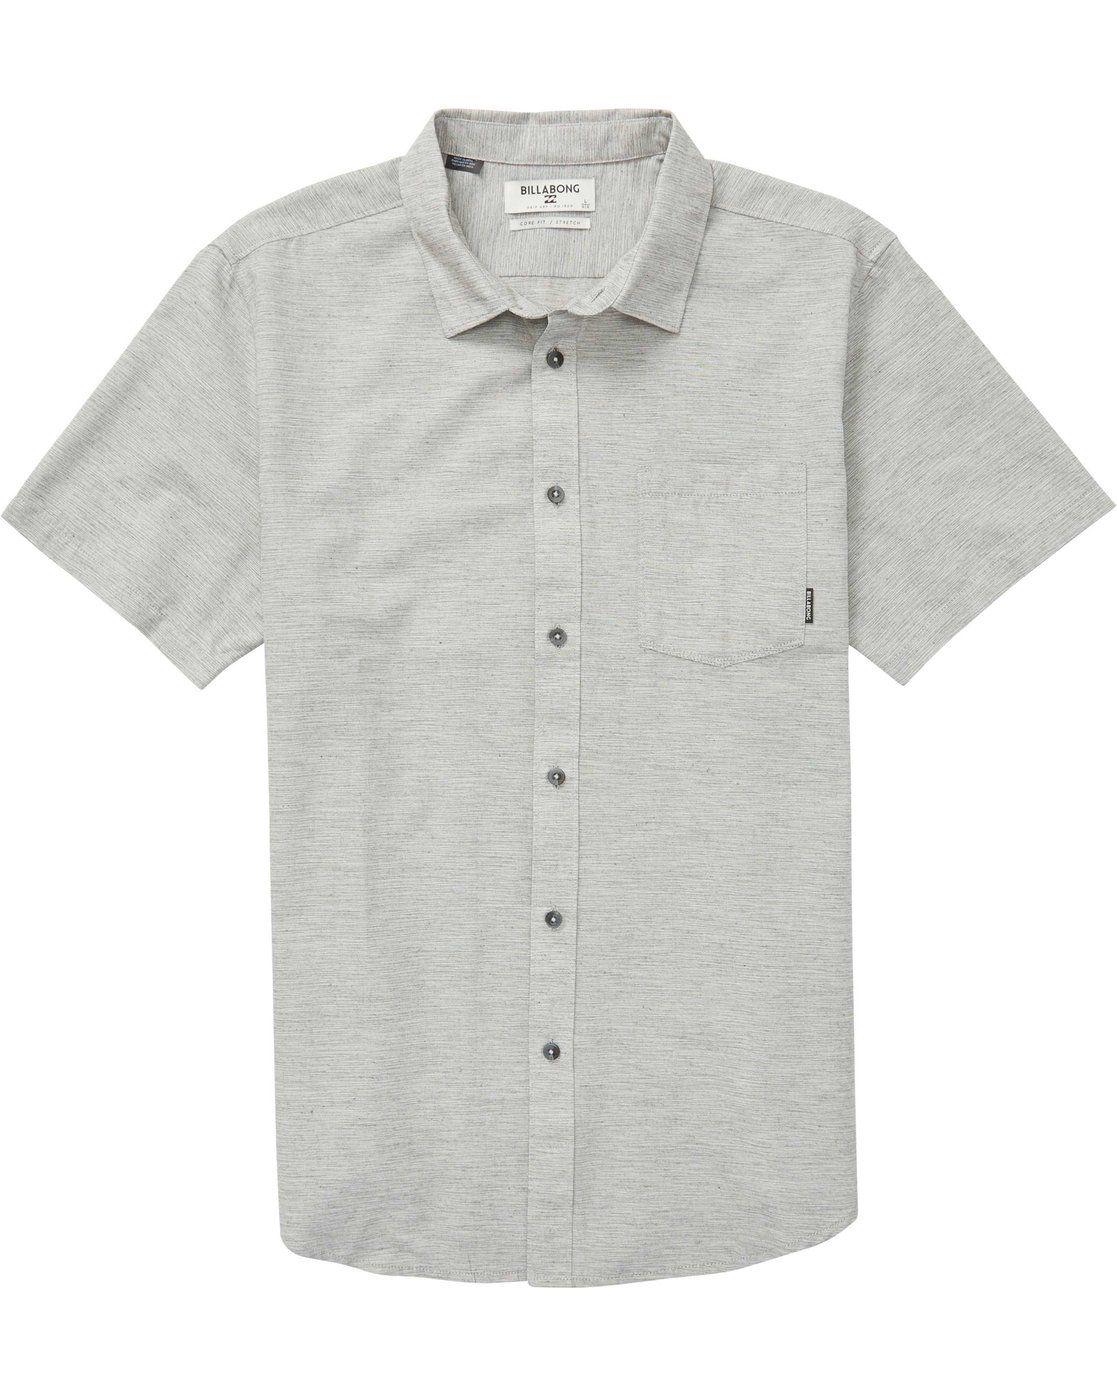 3a793674 All Day Helix Short Sleeve Shirt | session styling | Deeanna | Shirt ...